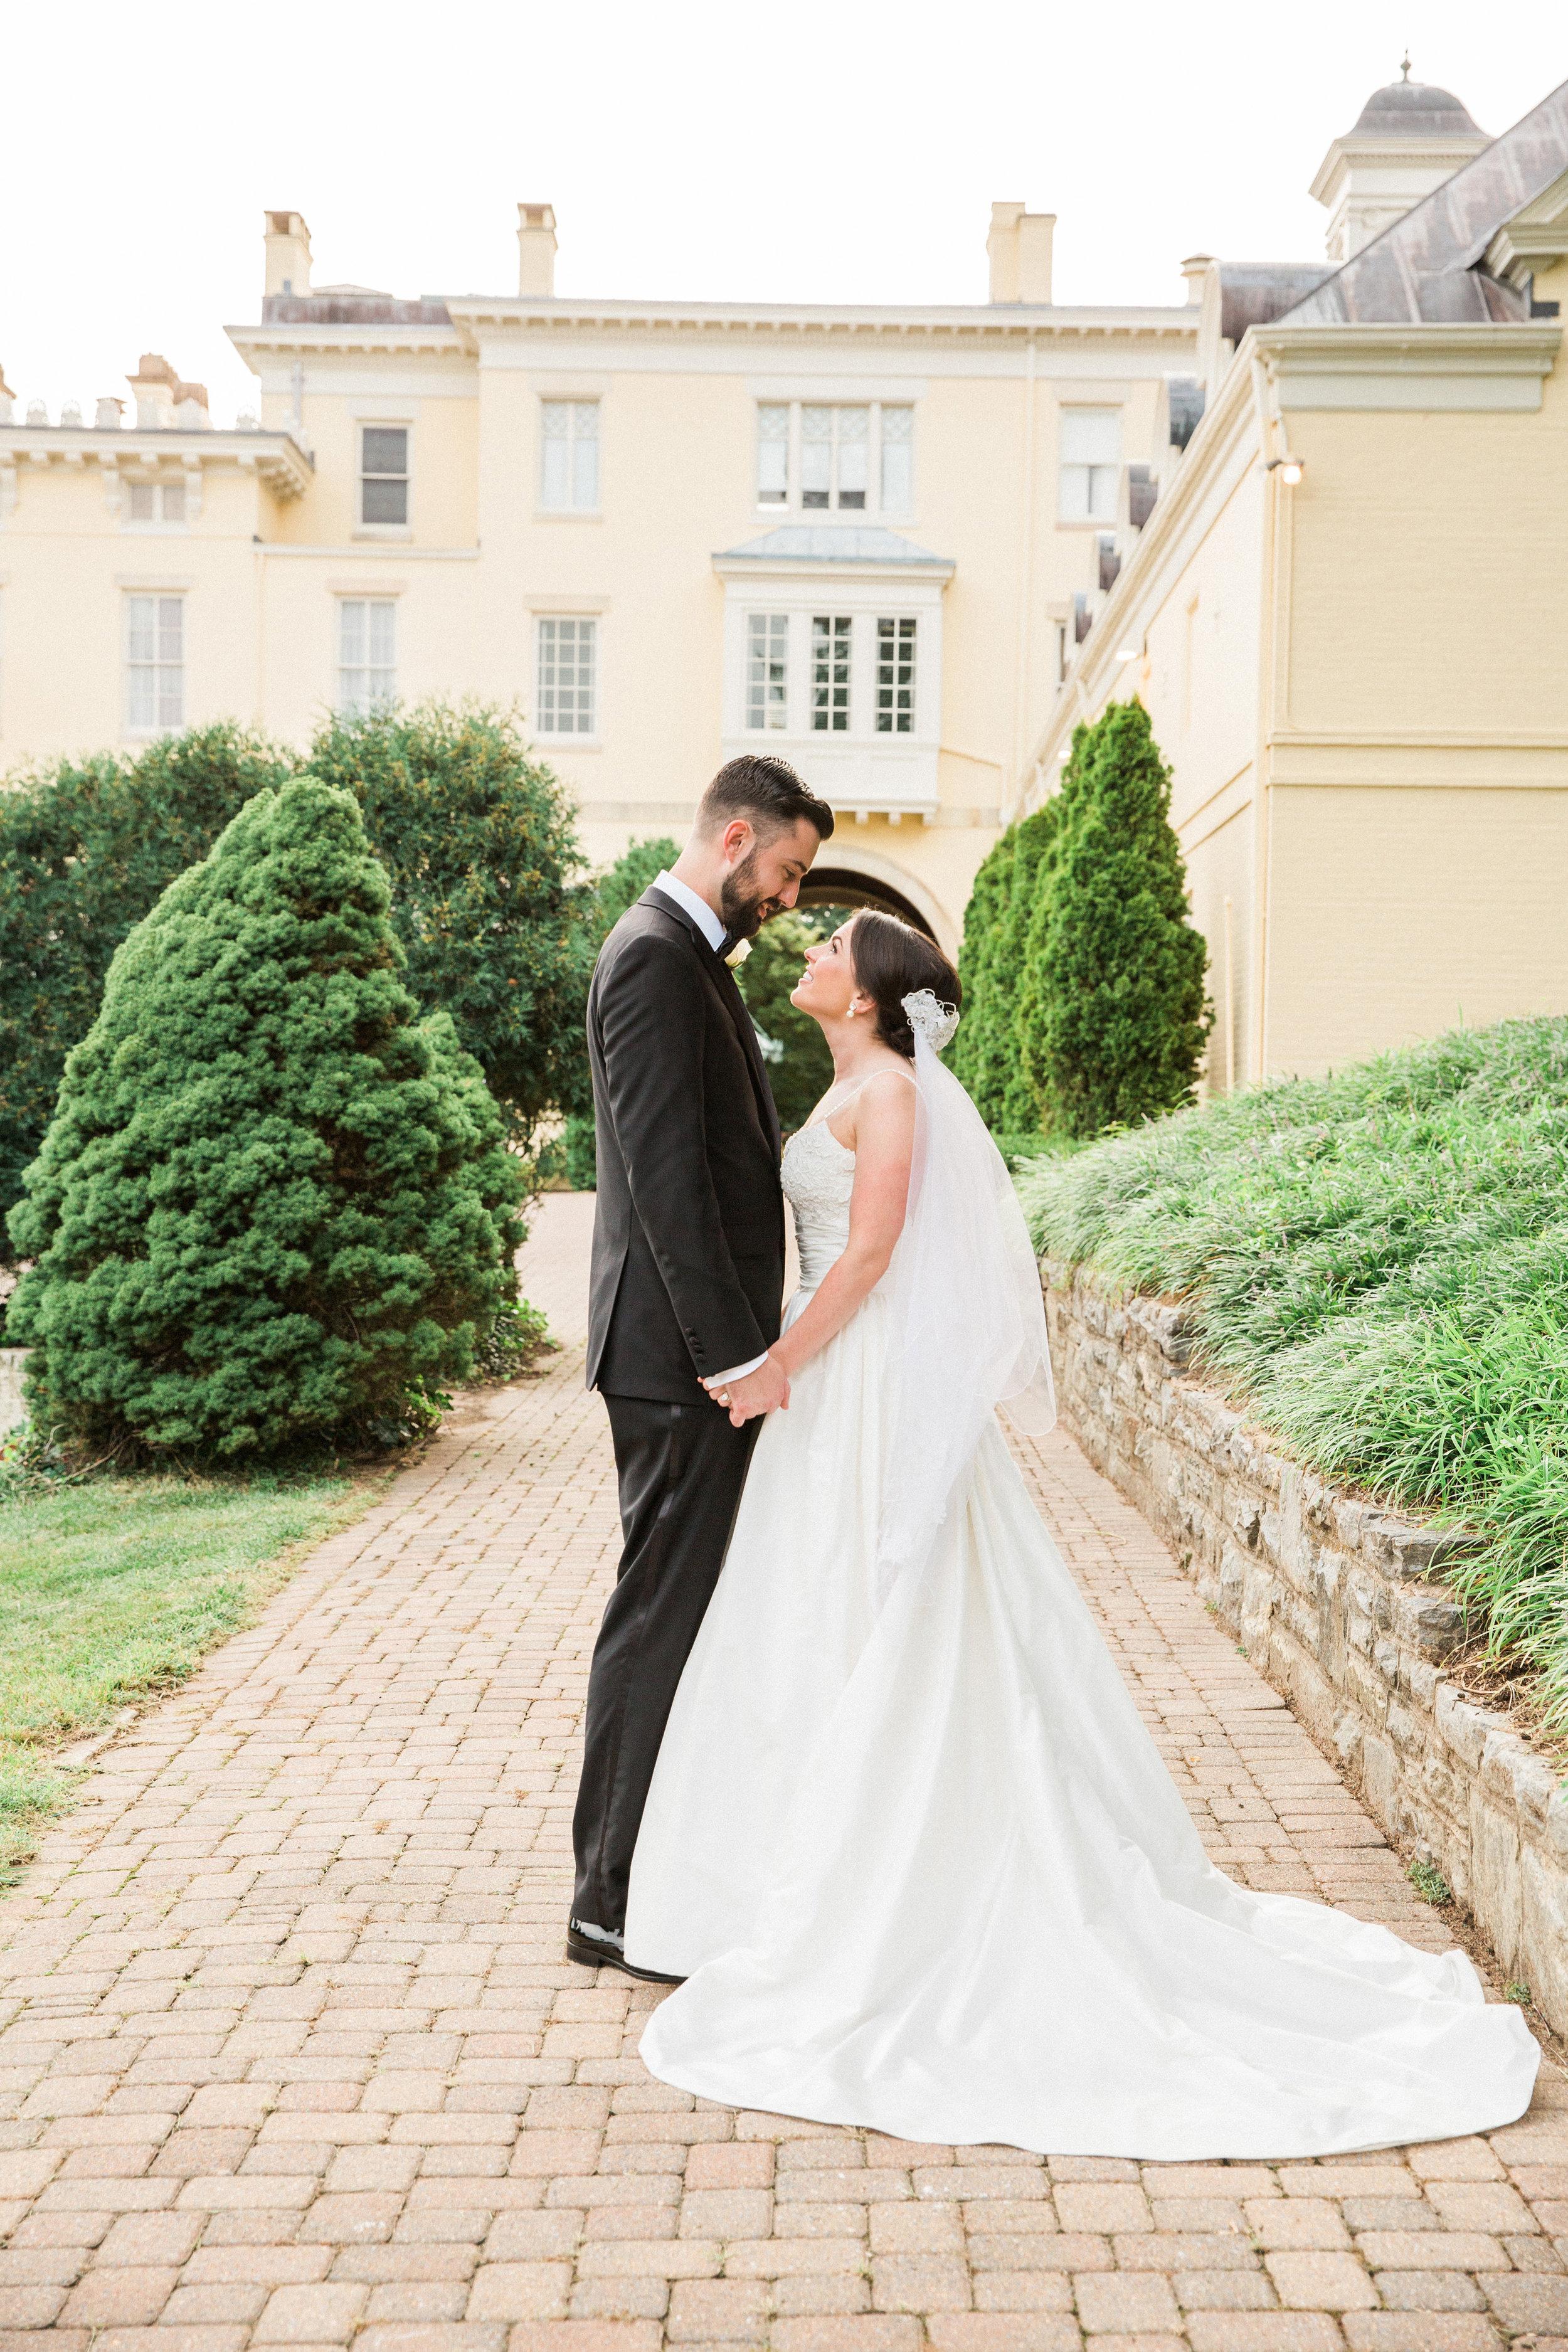 Evergreen-Museum-Balitmore-Maryland-Wedding-Black-Tie-Bride-034.jpg